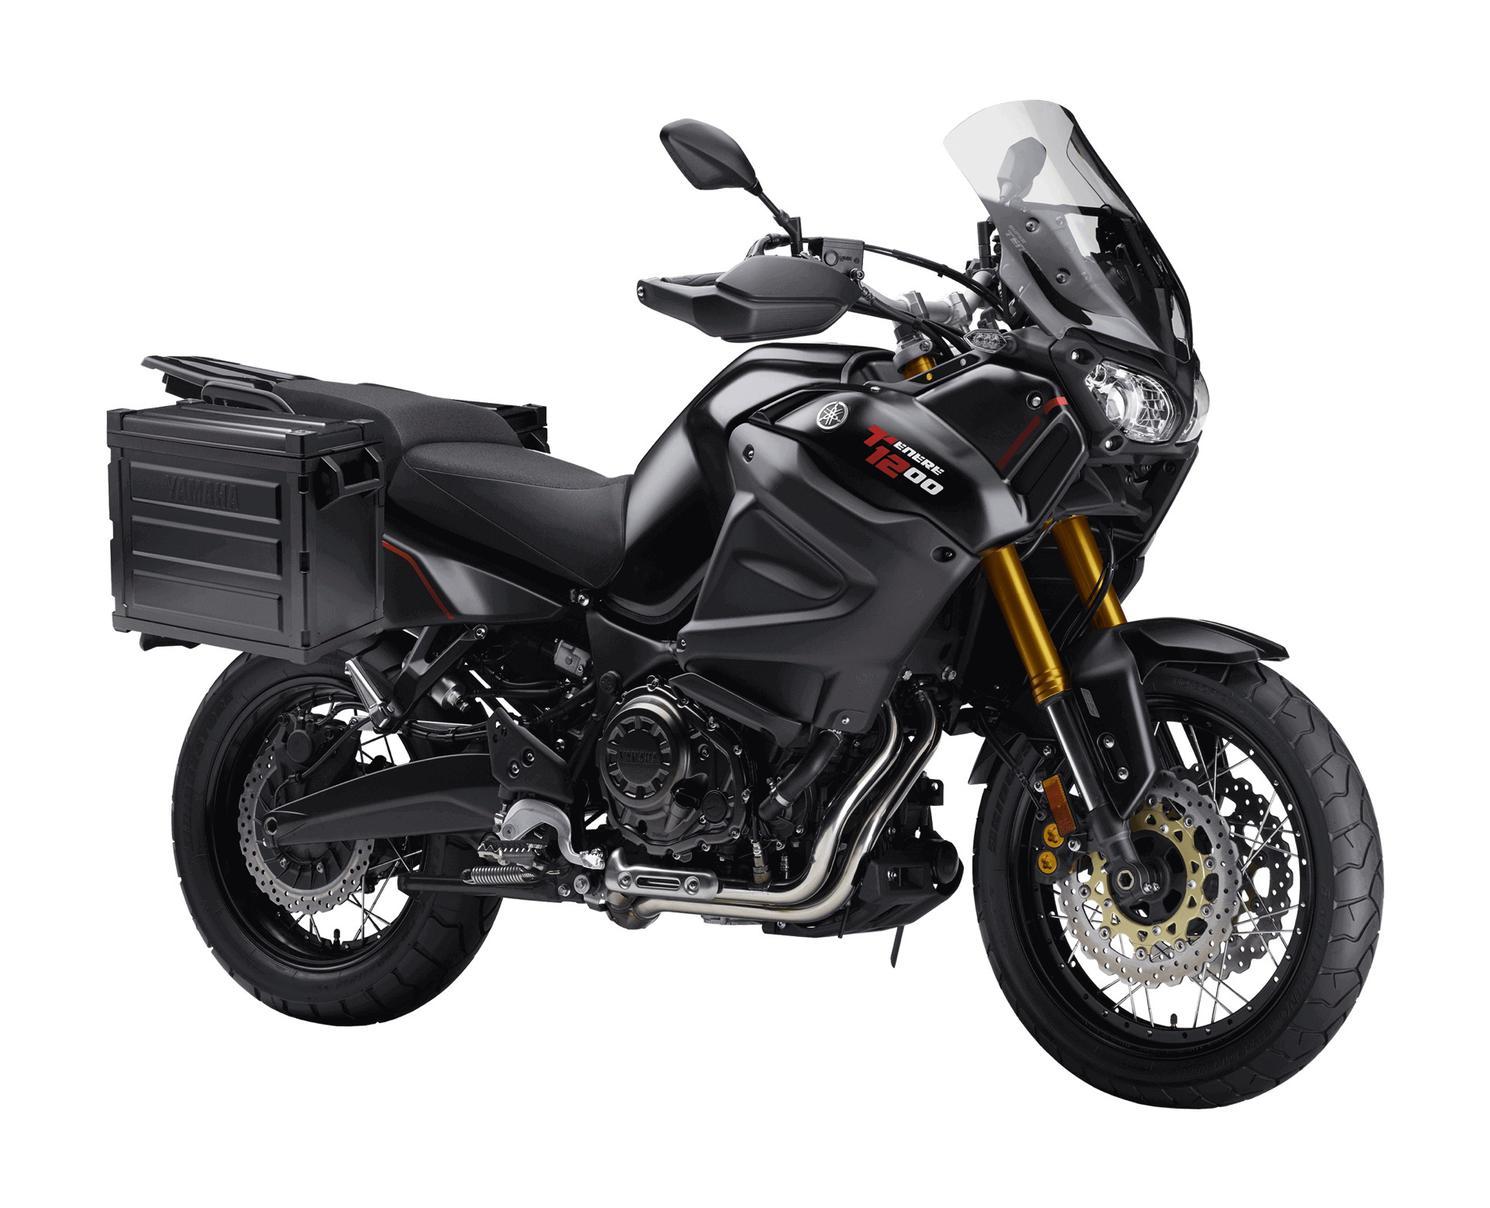 Yamaha Super Ténéré ES Mat Dark Gray Mettalic 6 2020